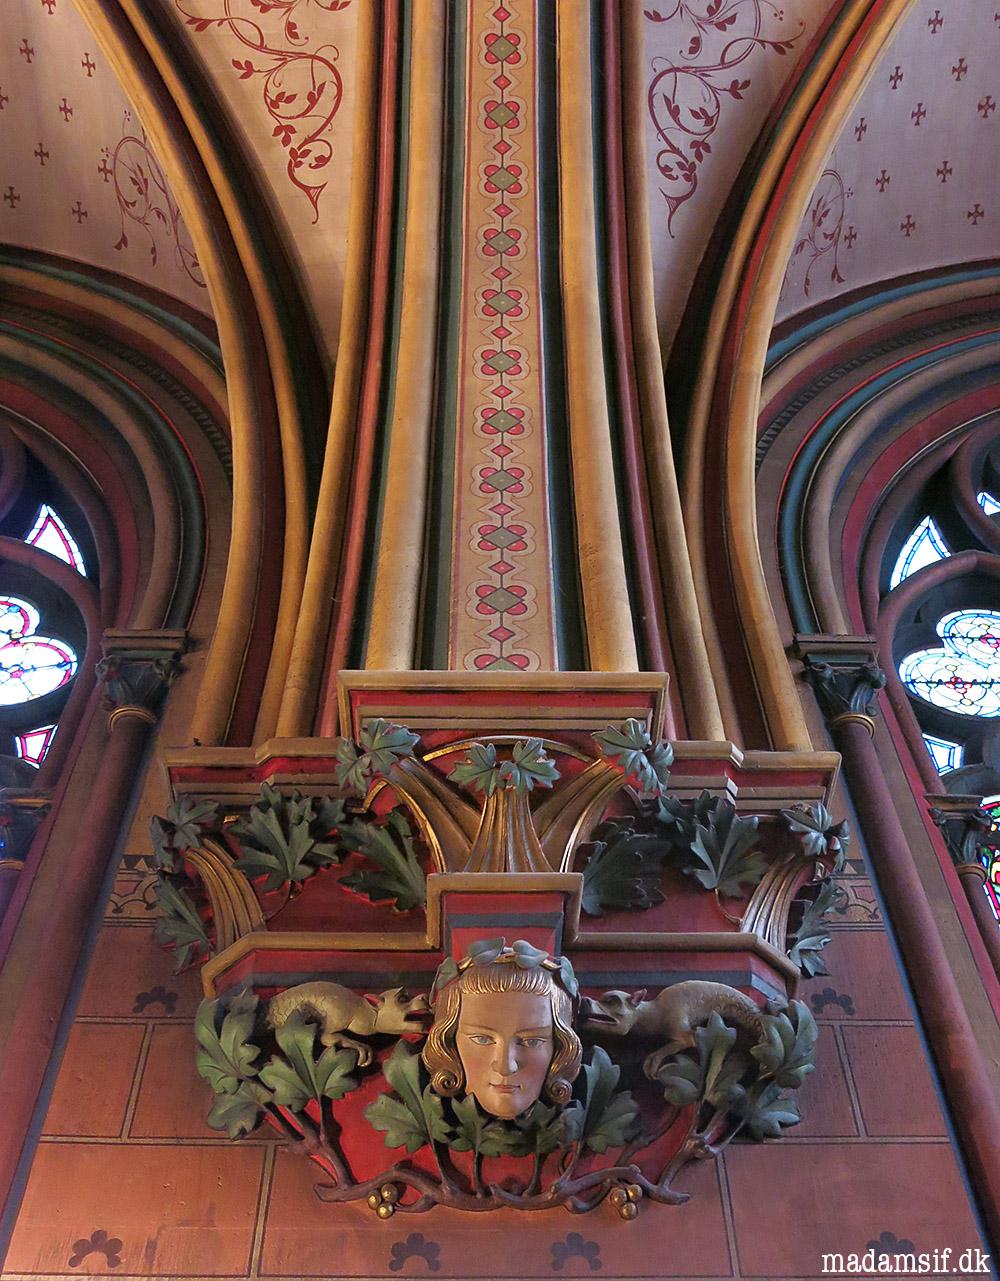 Notre-Dame de Paris, detalje.